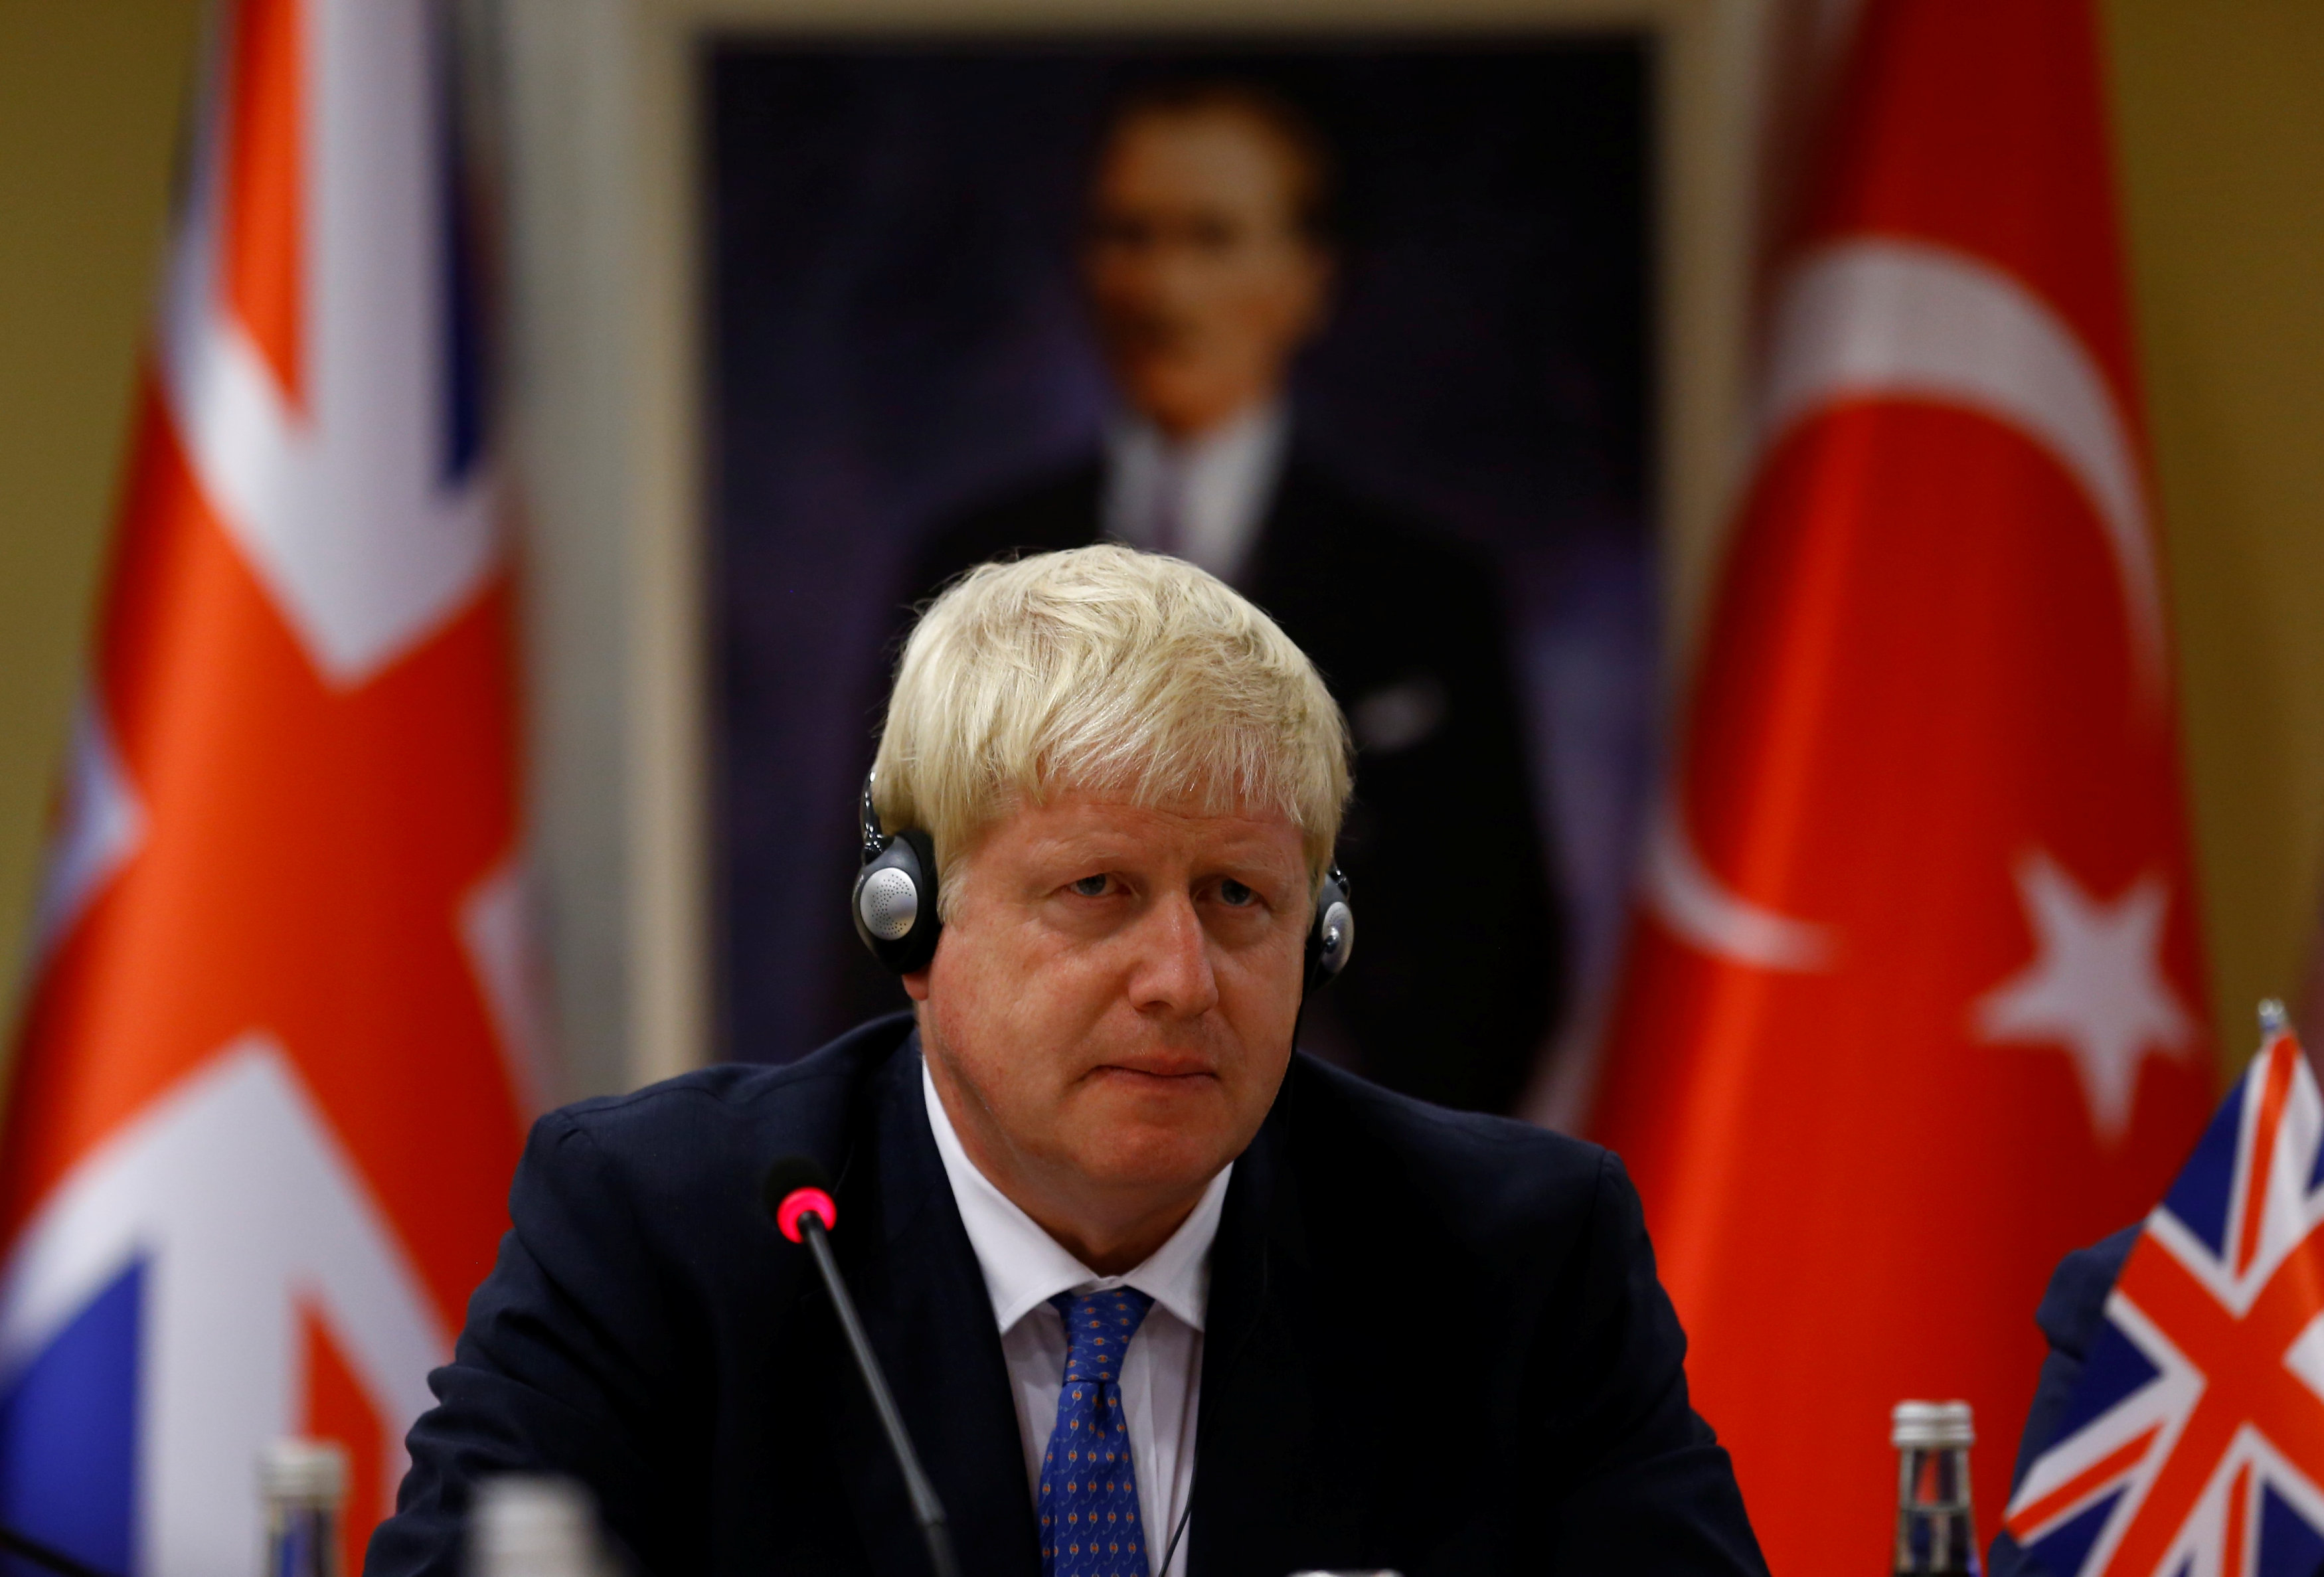 Jonshon Kemal 2016 09 26T165459Z 1665984752 S1BEUDOBXJAA RTRMADP 3 TURKEY BRITAIN copy